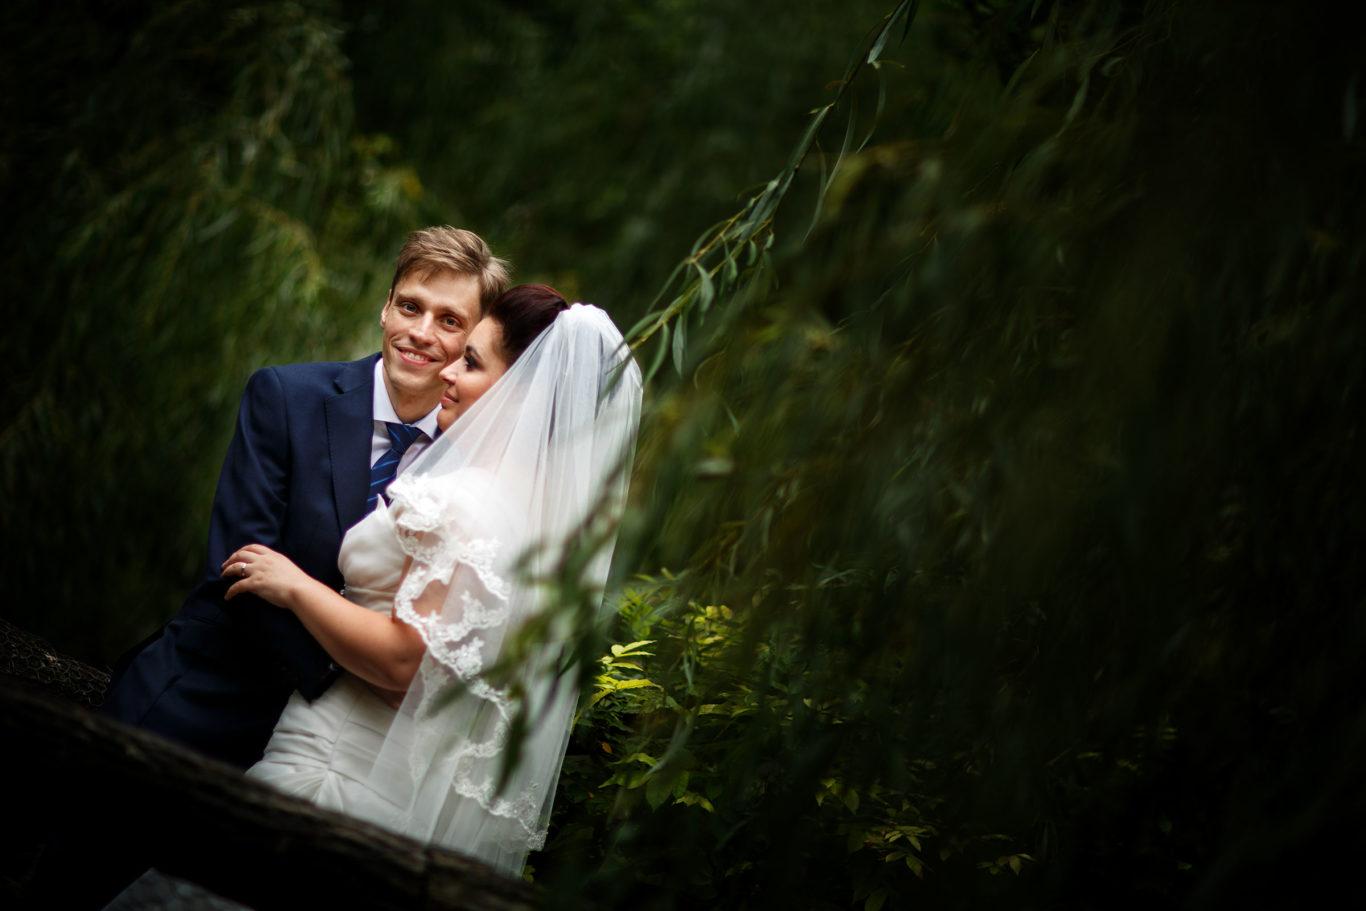 0357-Fotografie-nunta-Roxana-Costin-fotograf-Ciprian-Dumitrescu-DCF_6068